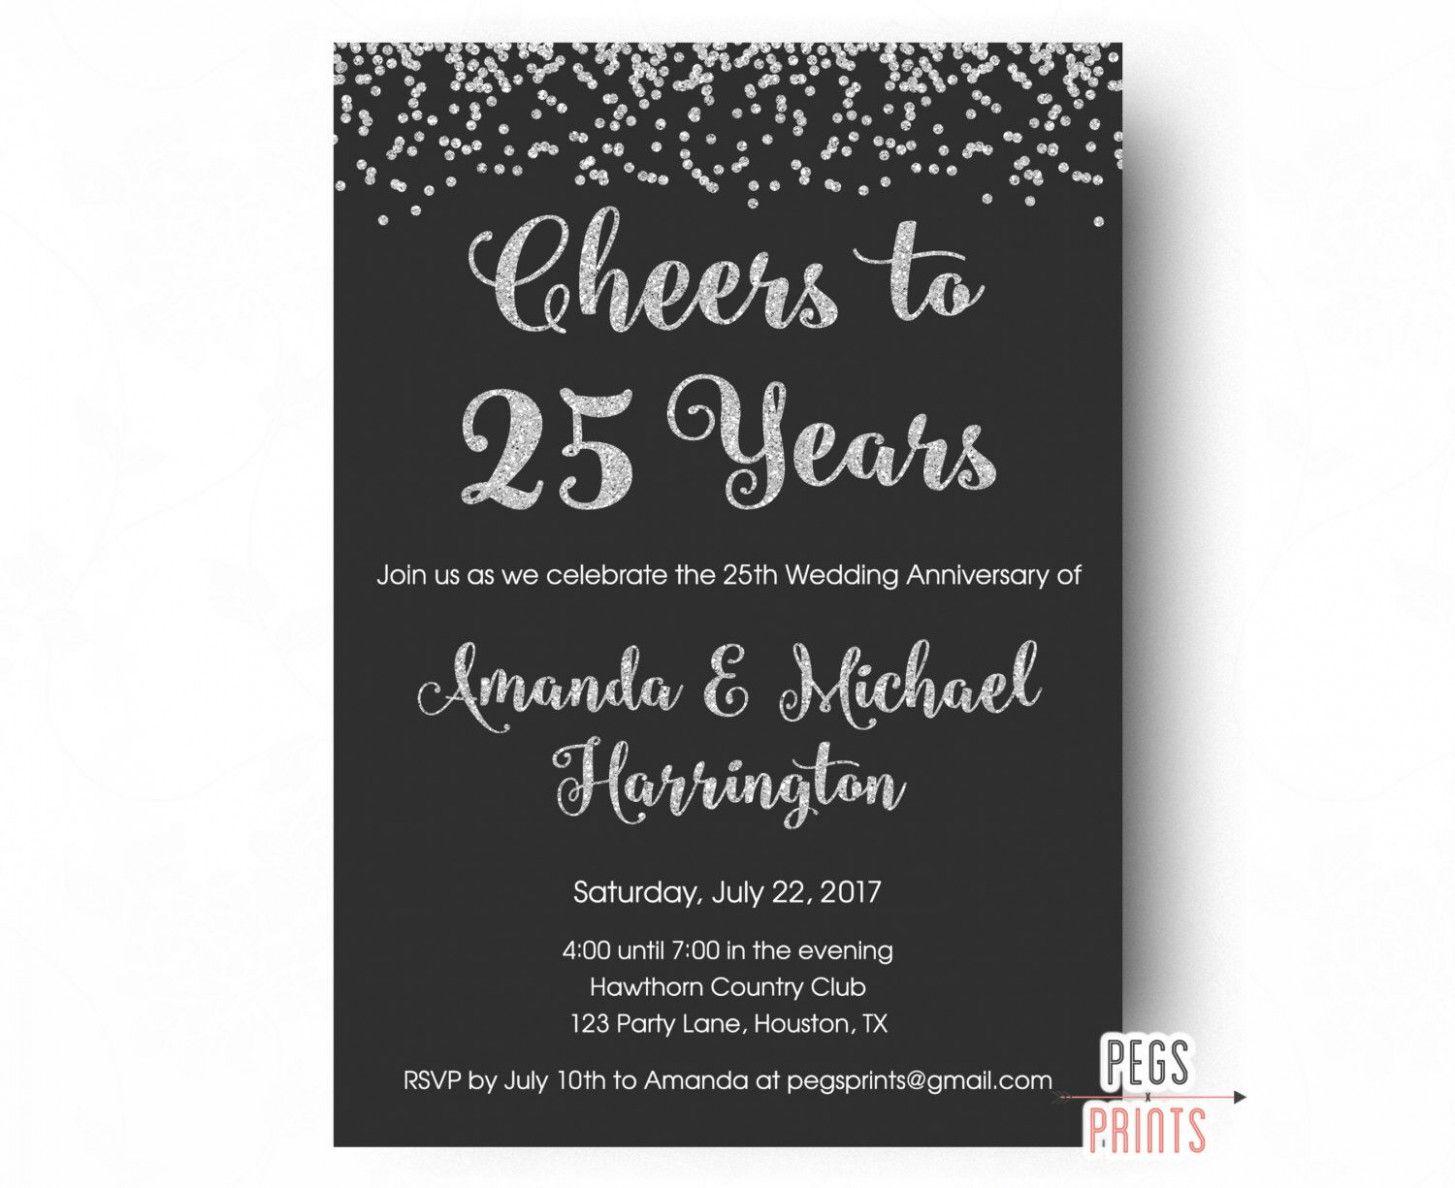 Categories Anniversary Invitation Card Maker - Free Photos